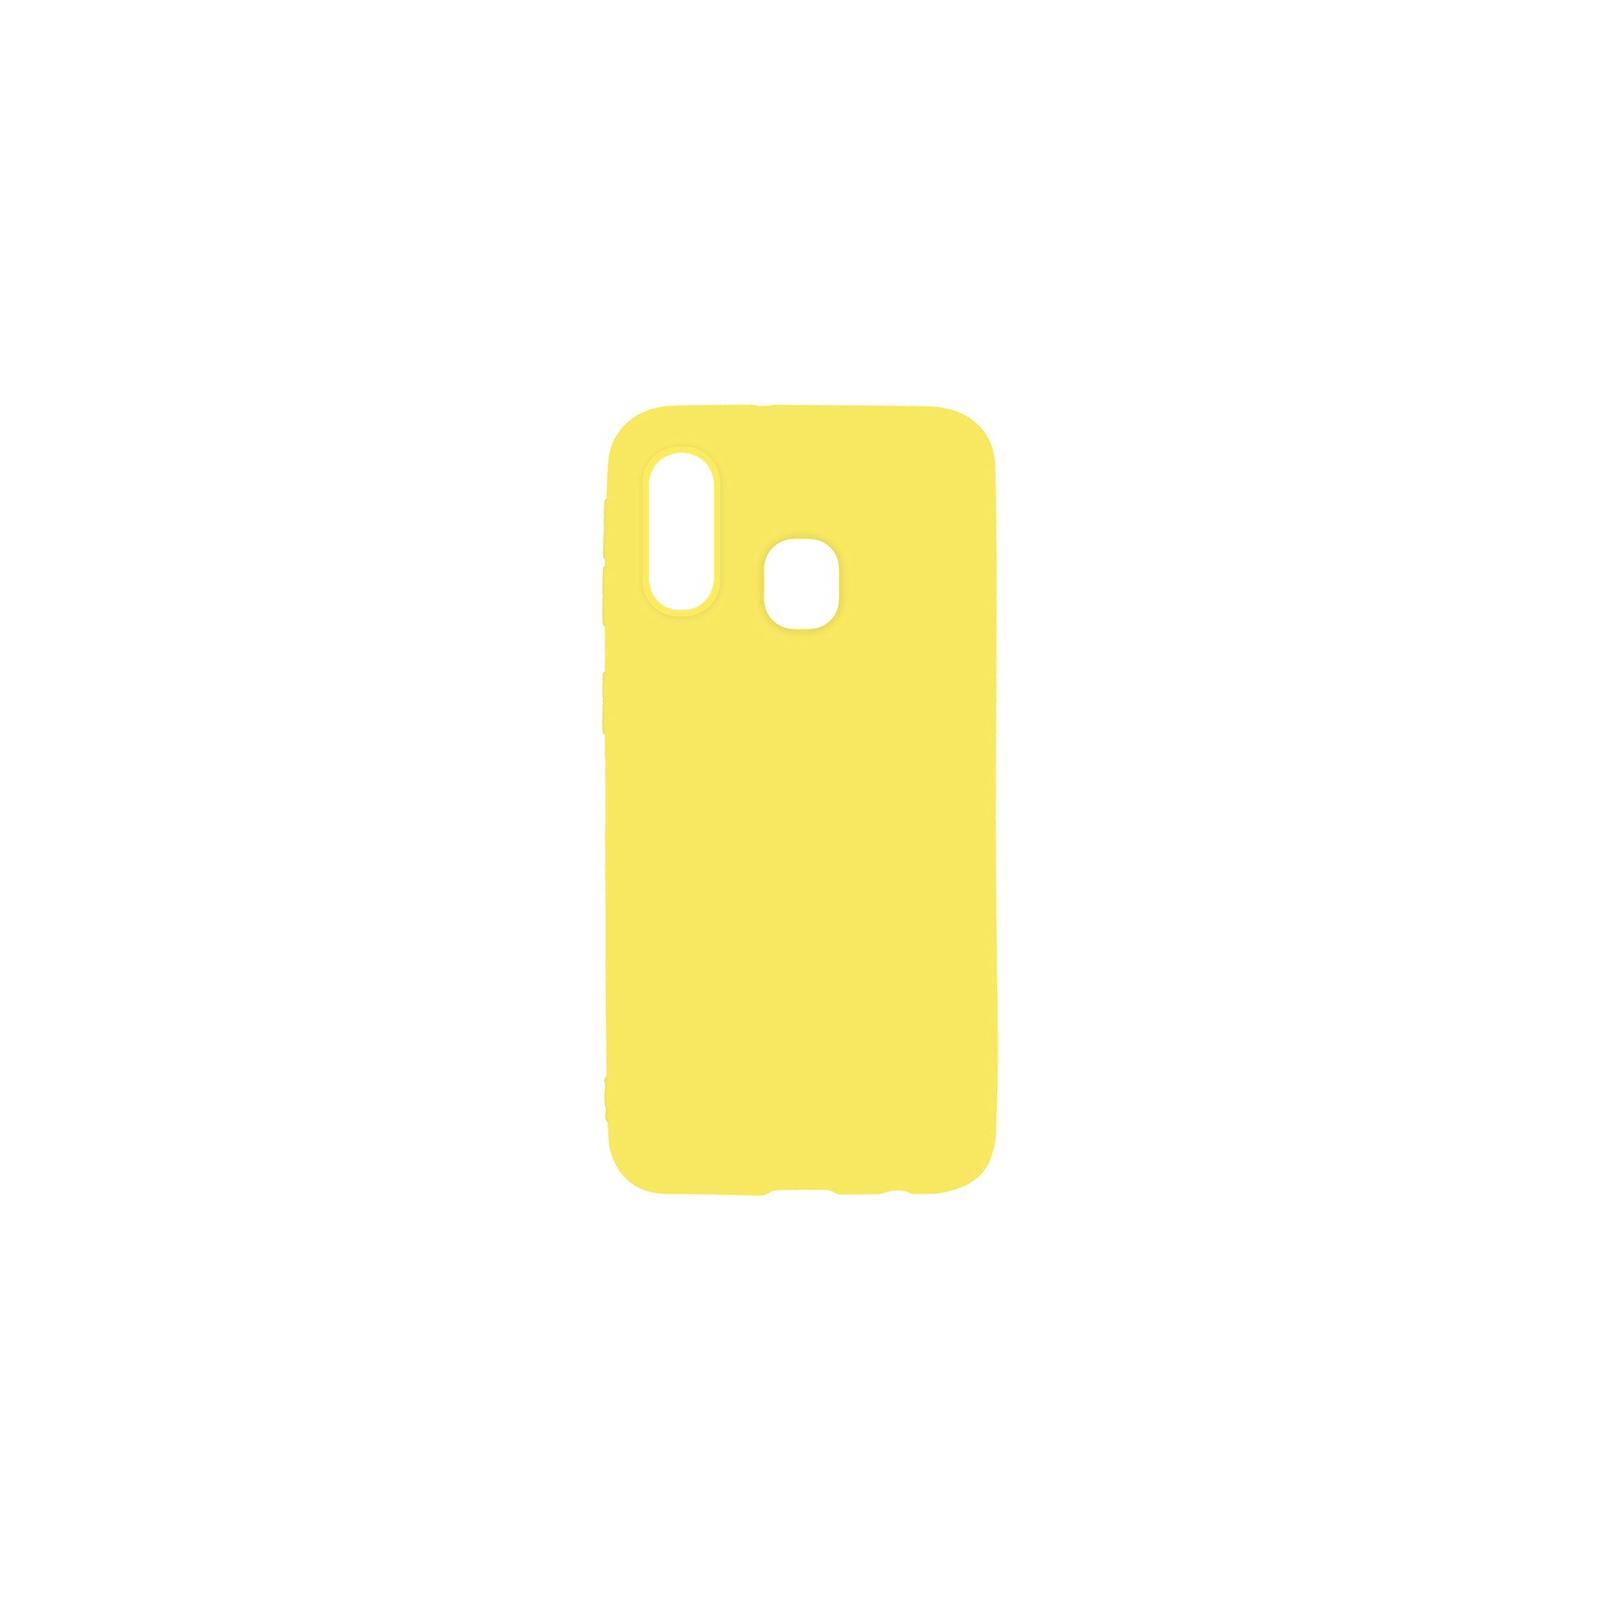 Чехол для моб. телефона Toto 1mm Matt TPU Case Samsung Galaxy A40 Yellow (F_93859)